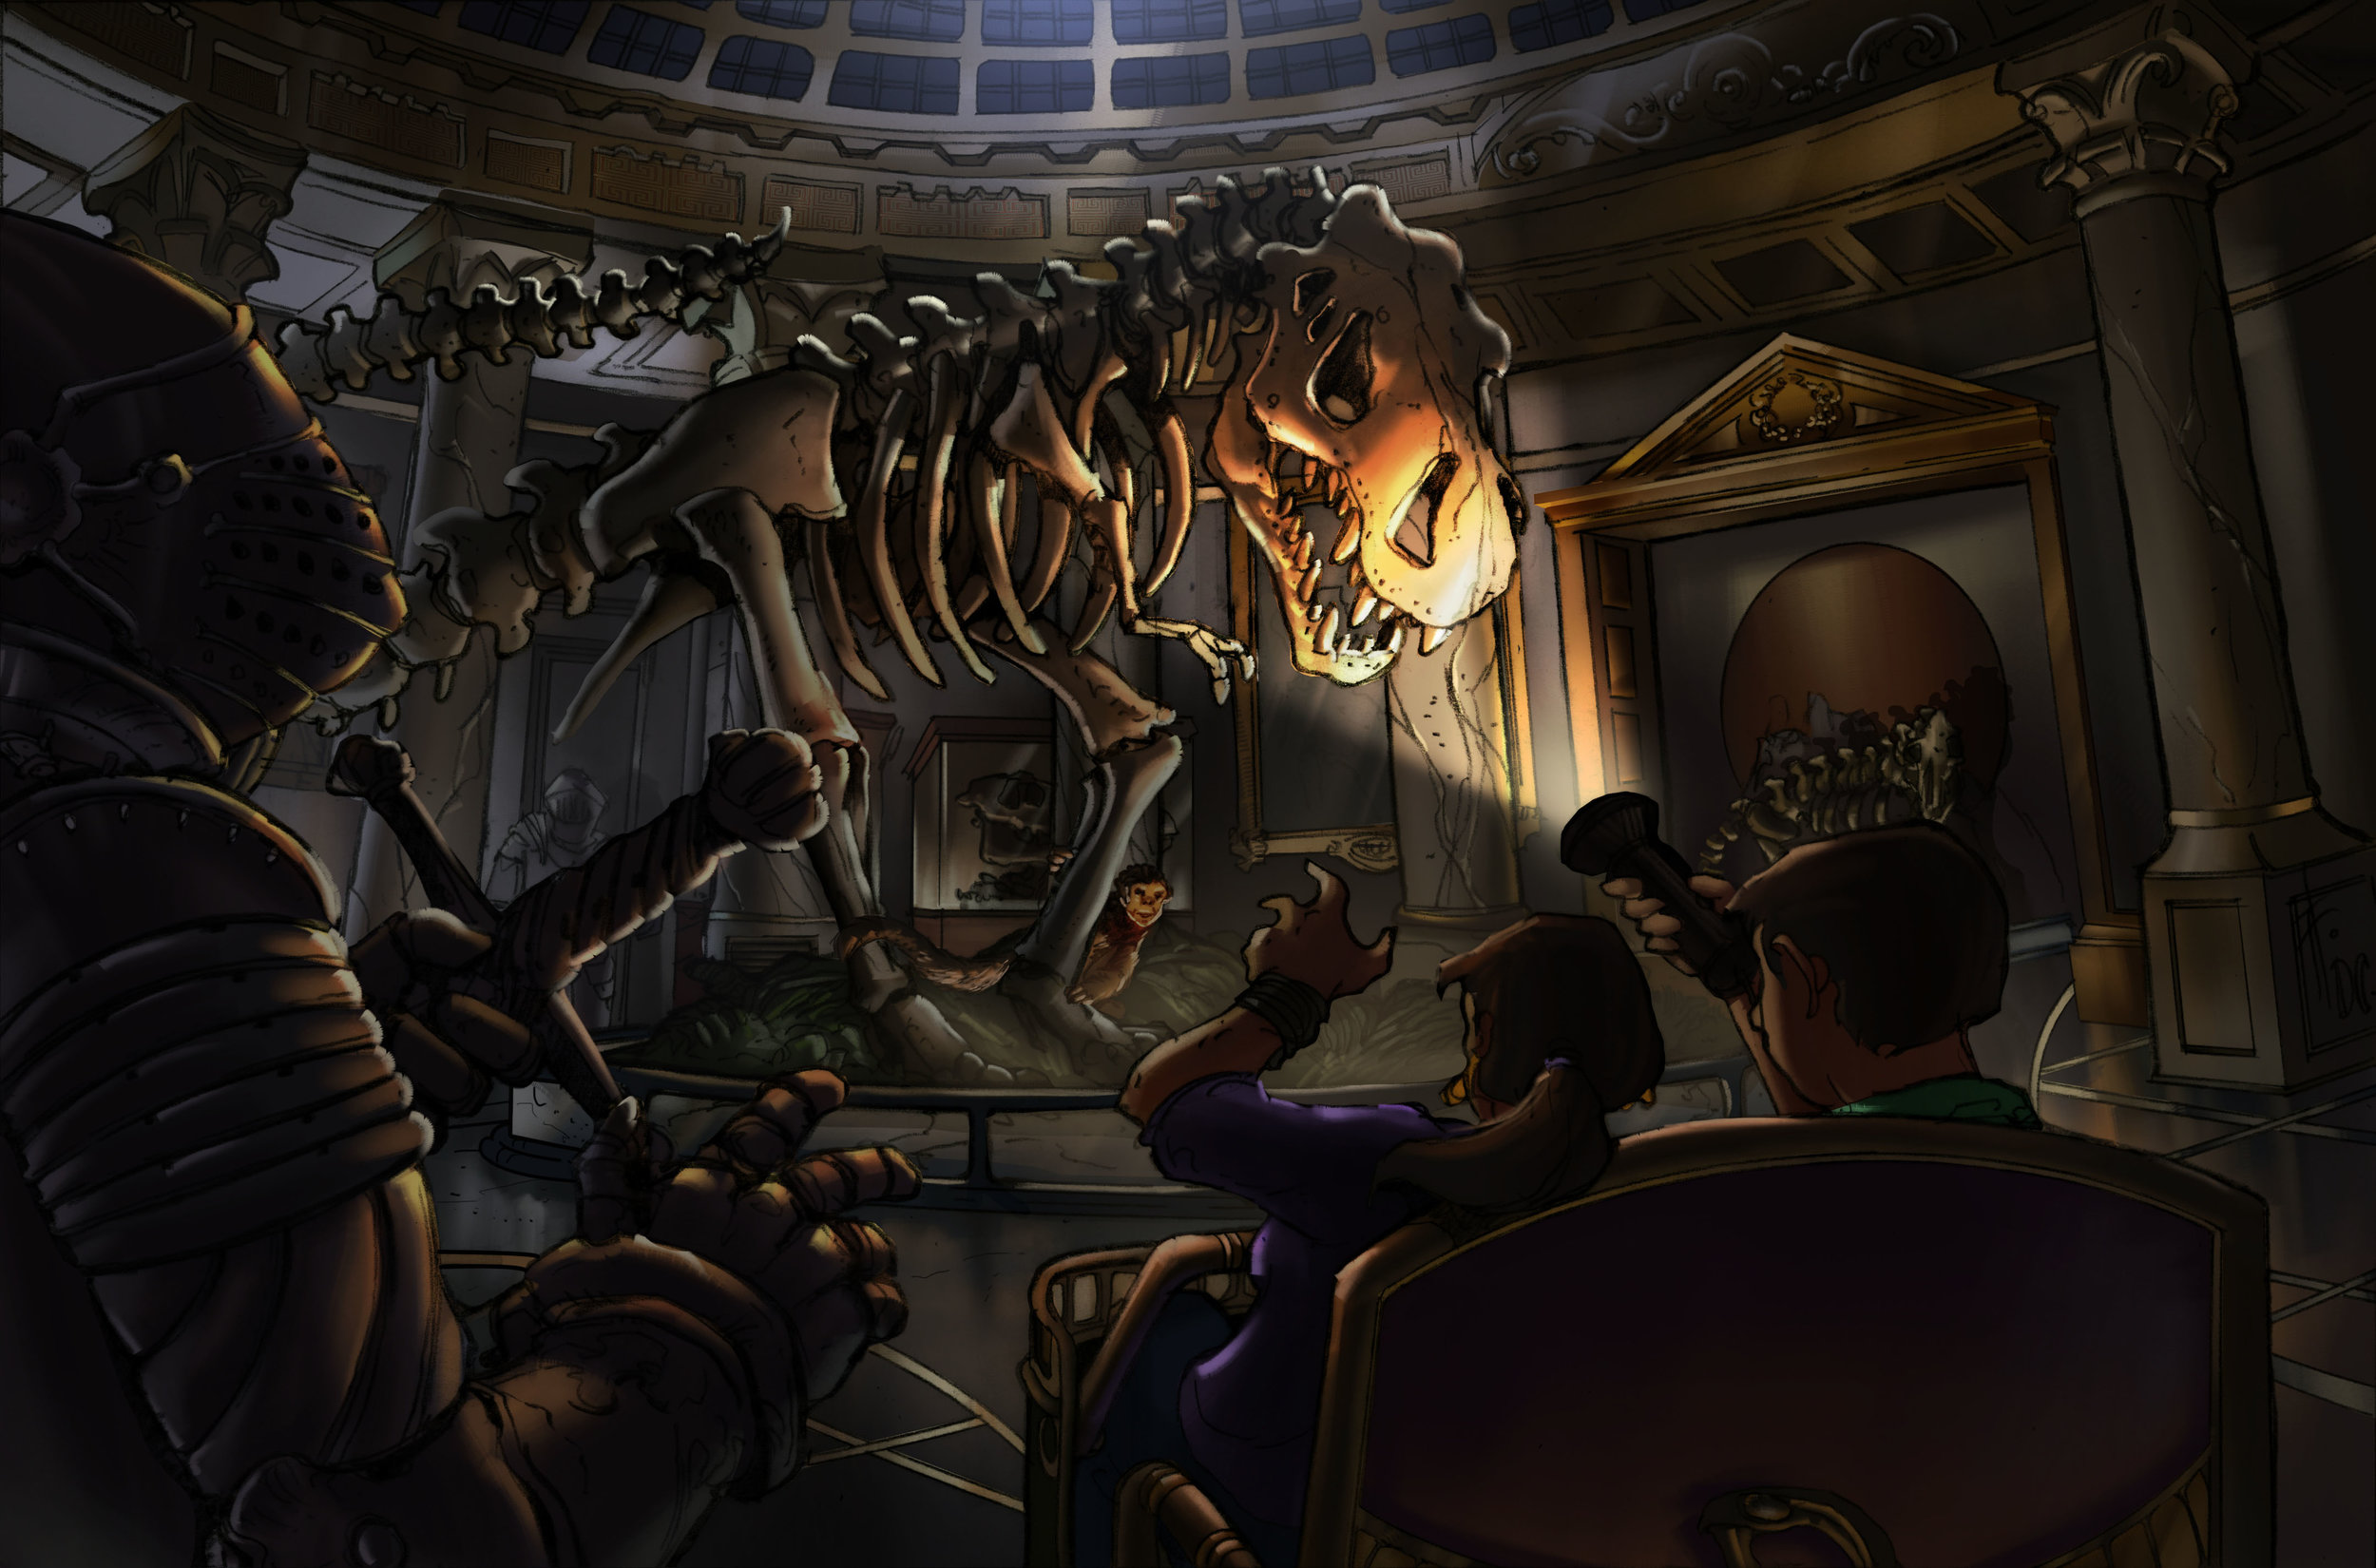 Fox_Night_at_the _Museum_Scene_2_Concept_#1C_FA-stefan.jpg